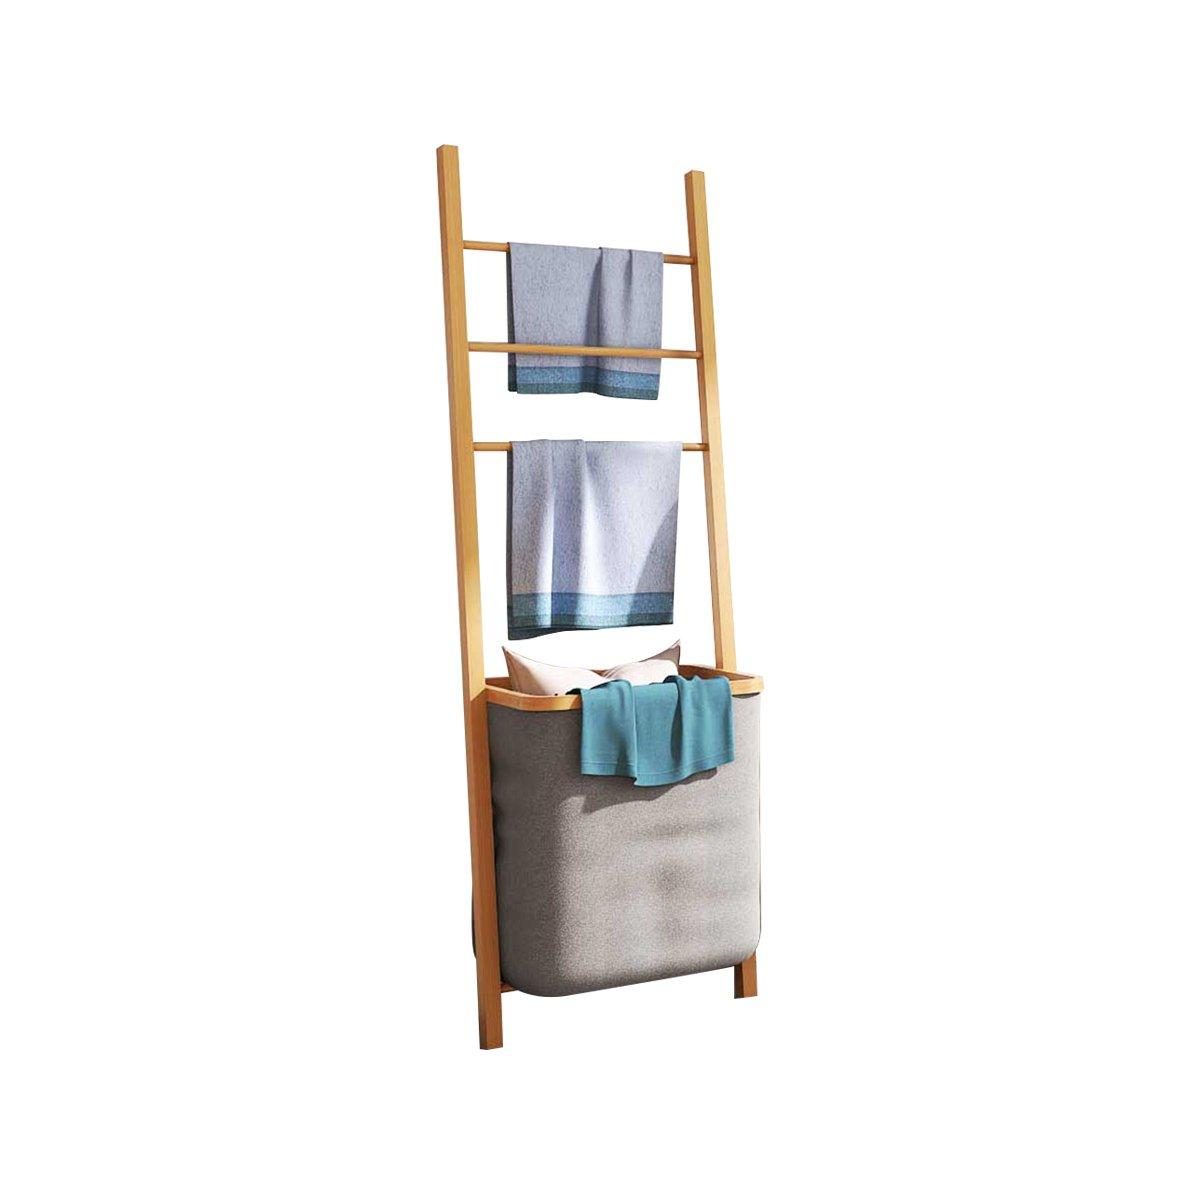 Enjoyable Laundry Basket Bamboo Towel Holder Towel Rack Washing Box Bin Storage Hamper Washing Cloth Basket Bathroom Shelf With Removable Laundry Basket Natural Download Free Architecture Designs Grimeyleaguecom